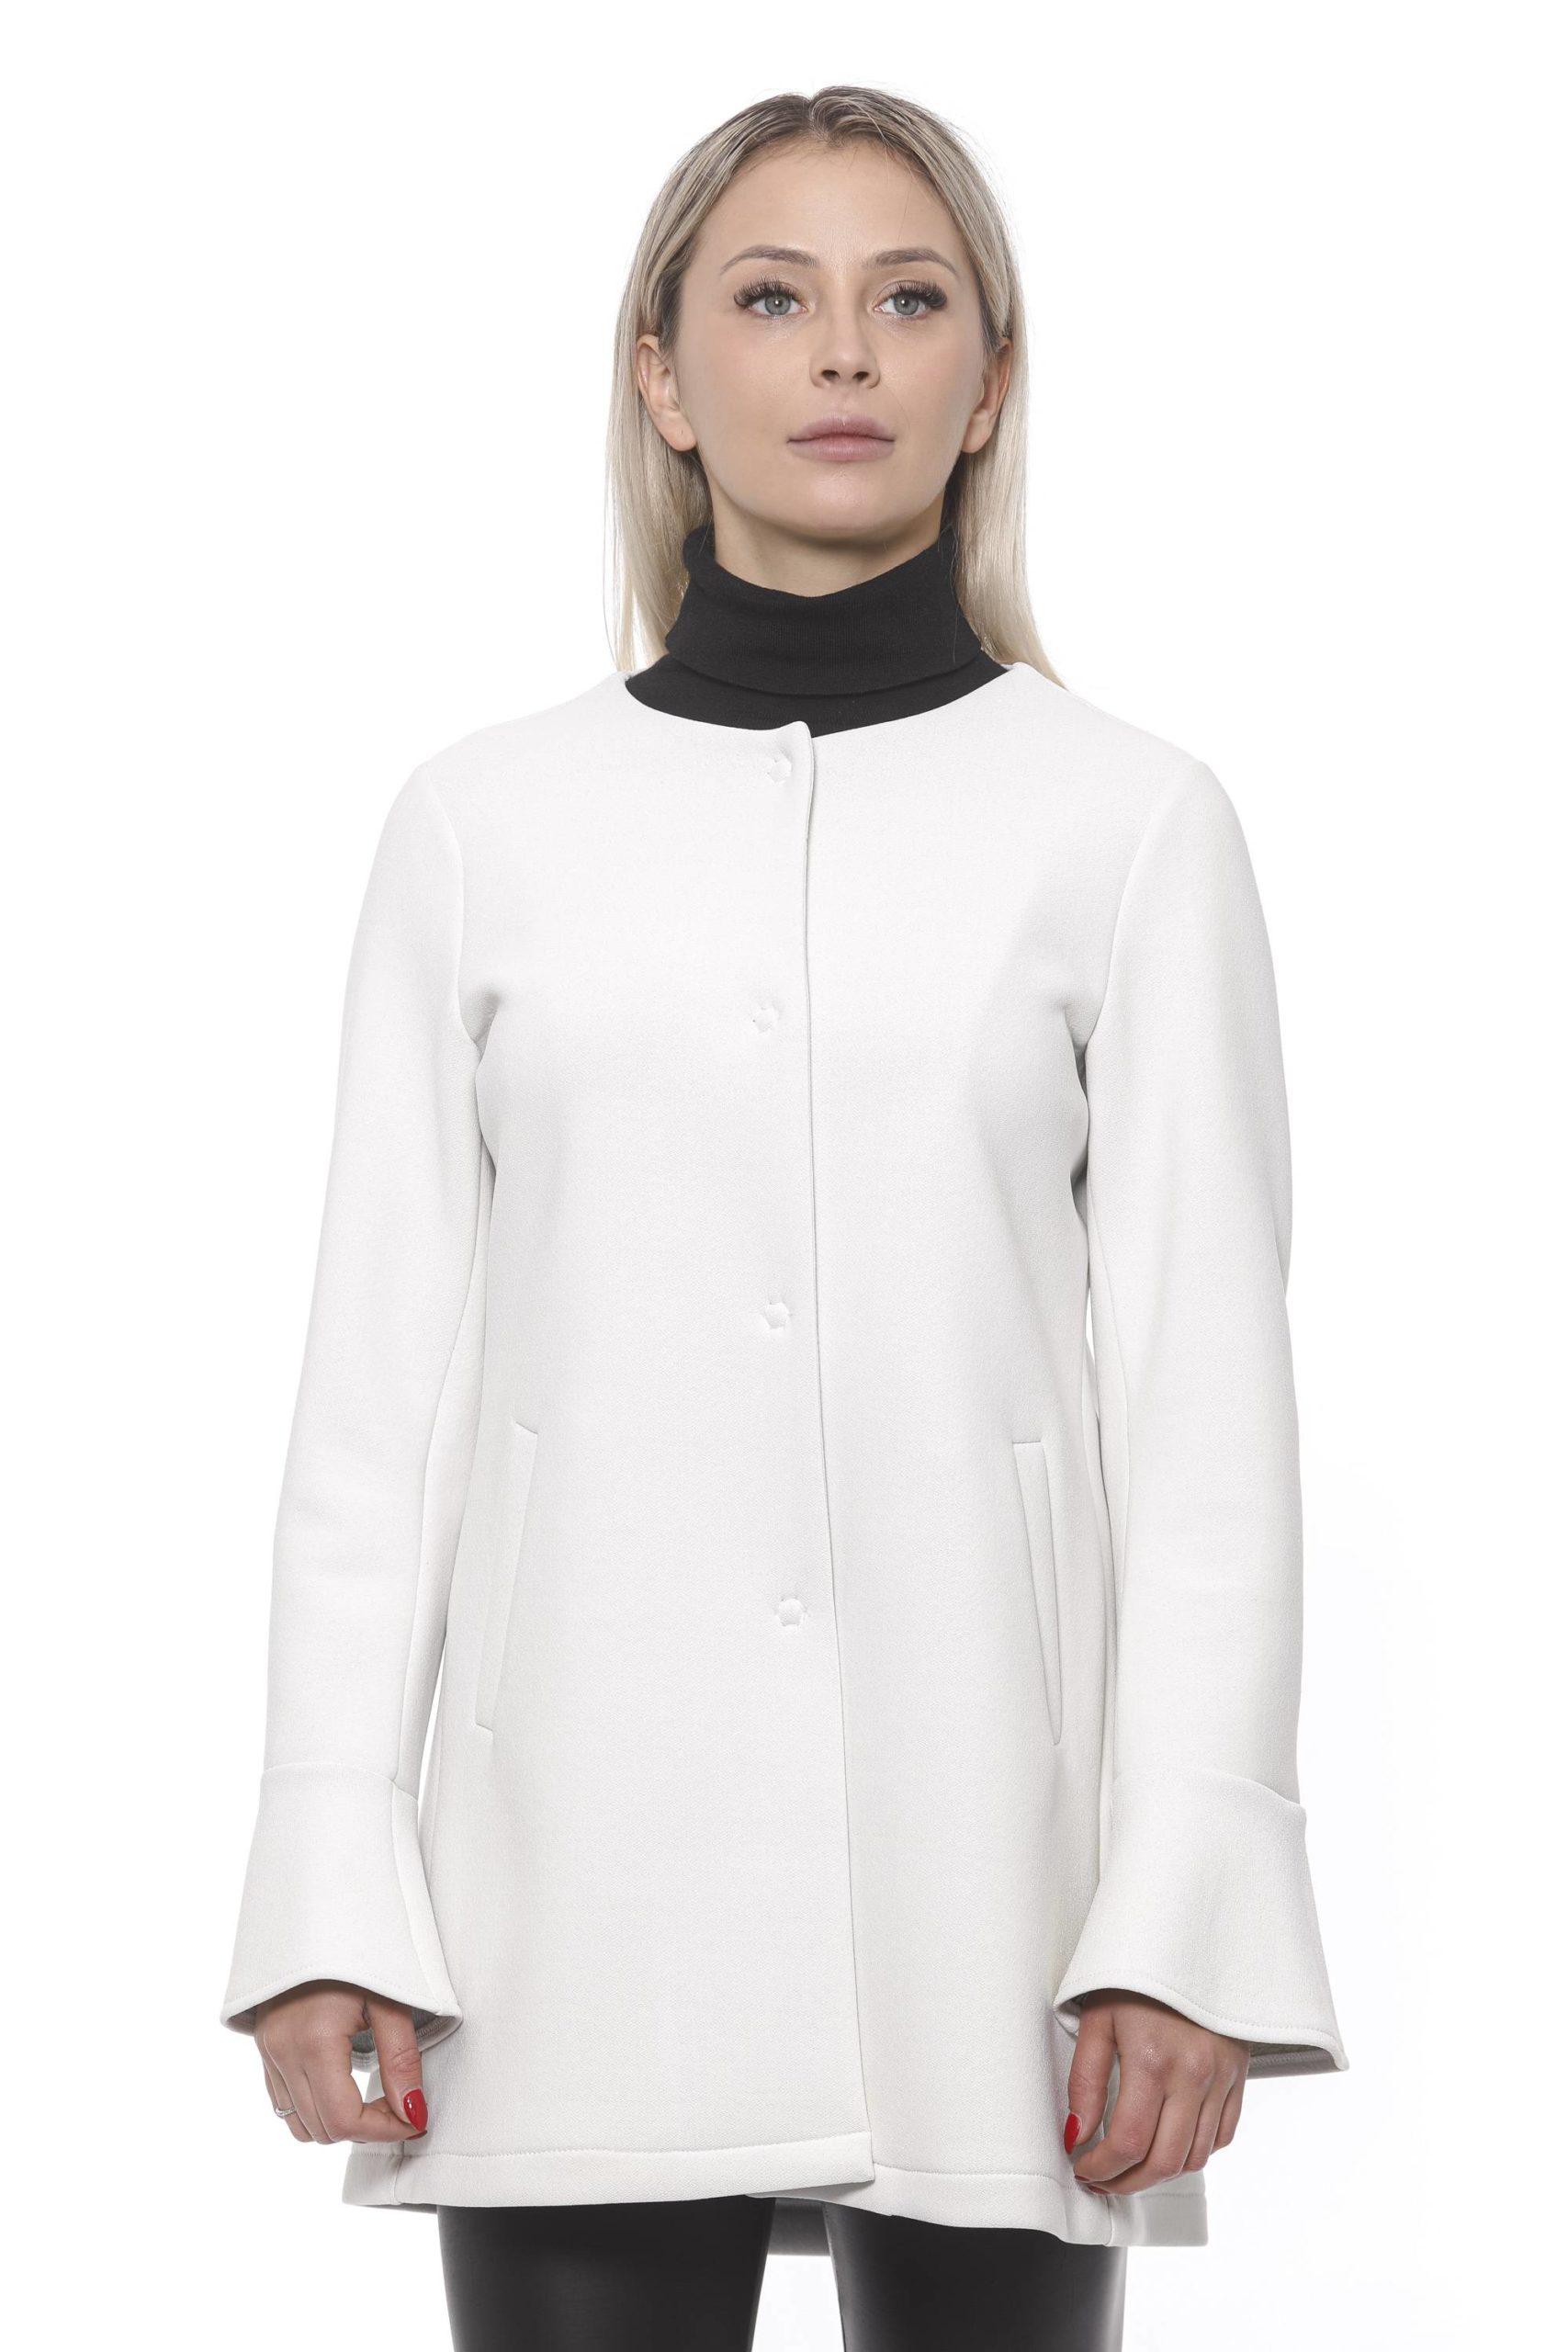 19V69 Italia Women's Ghiaccio Ice Jacket 191388332 - M